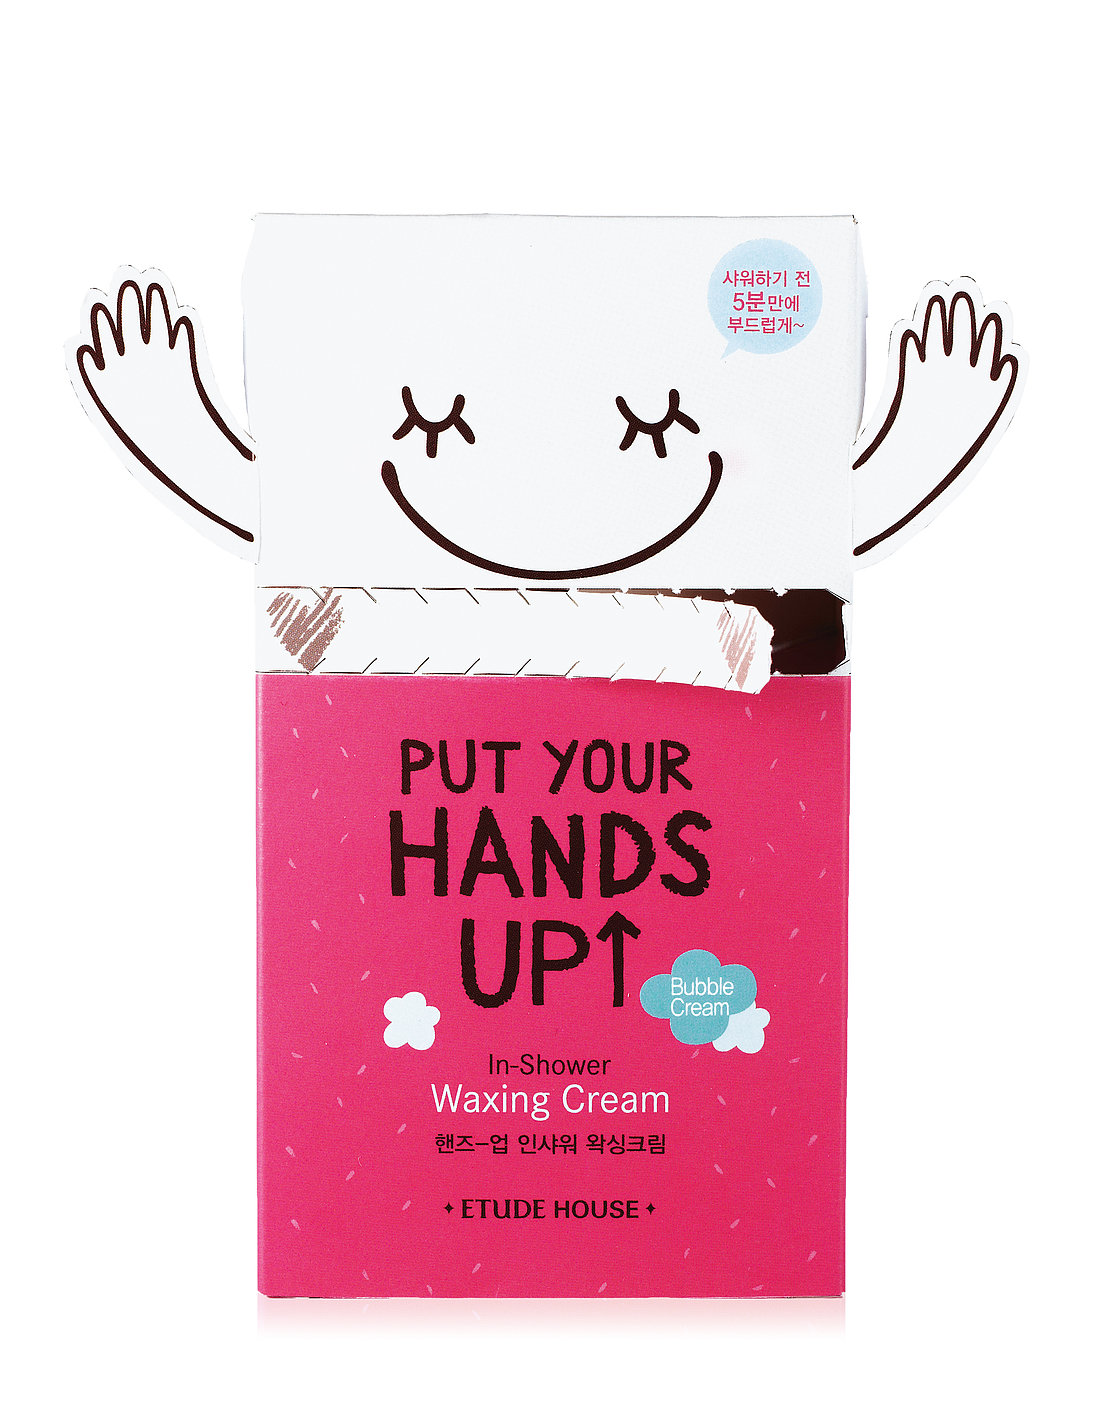 Hands Up Deodorant Depilatory   Red Dot Design Award